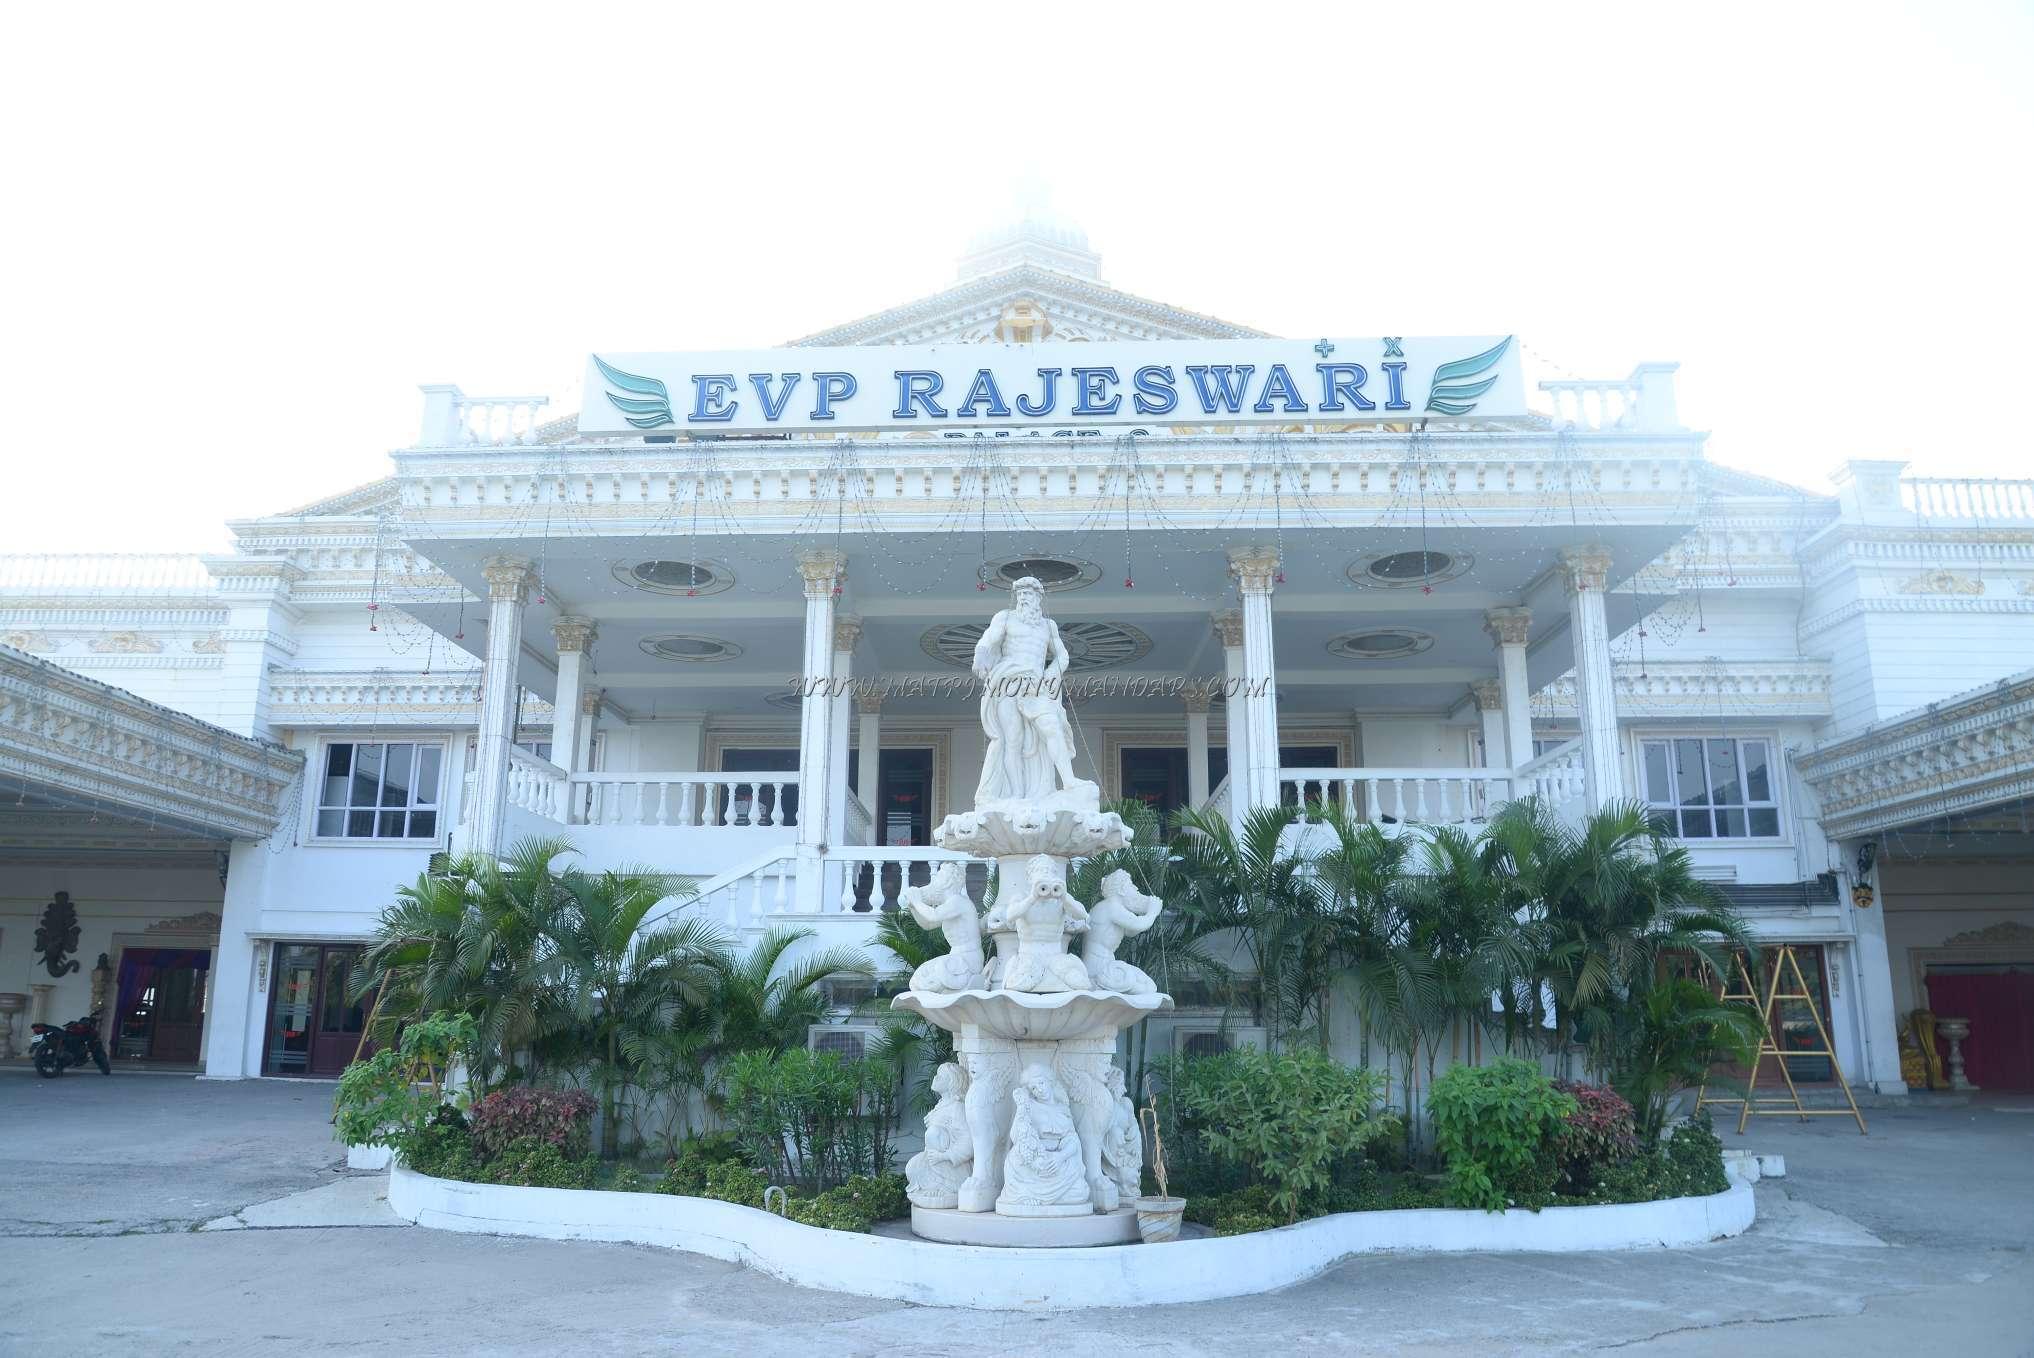 EVP Rajeswari Marriage Palace 2 - Building View